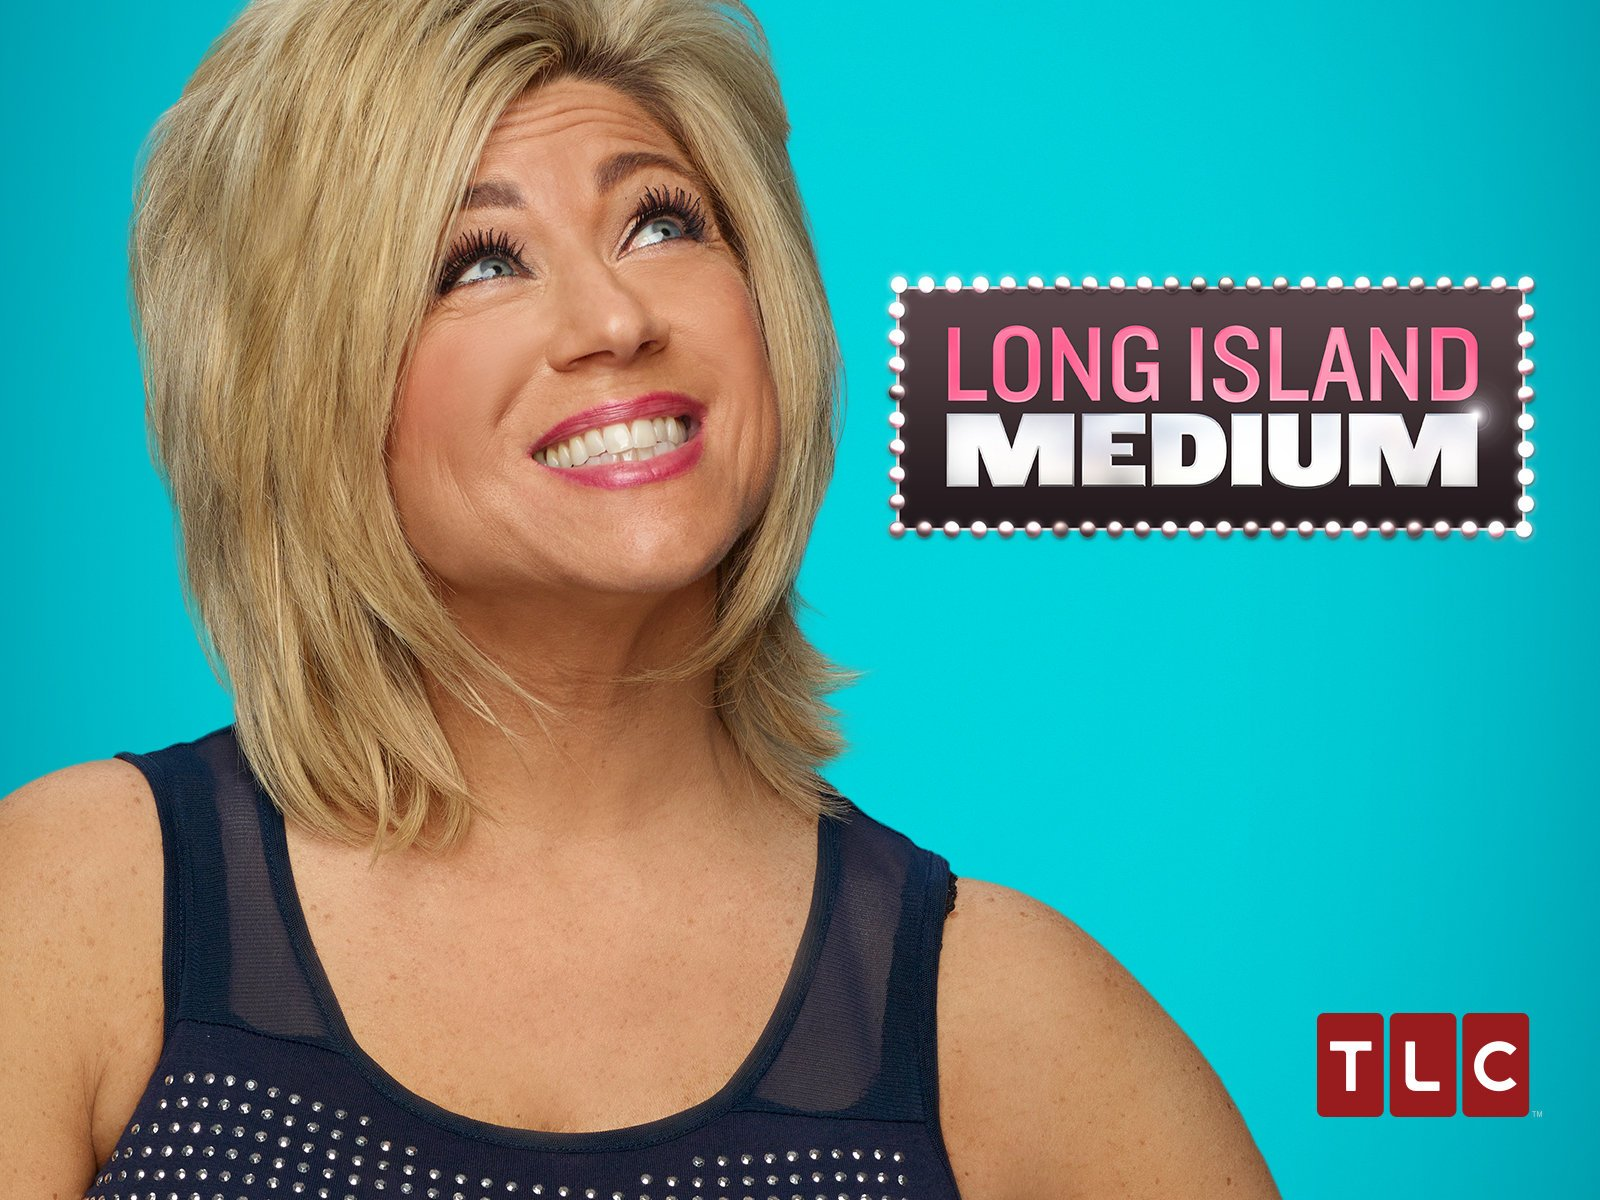 long island medium season 13 episode 7